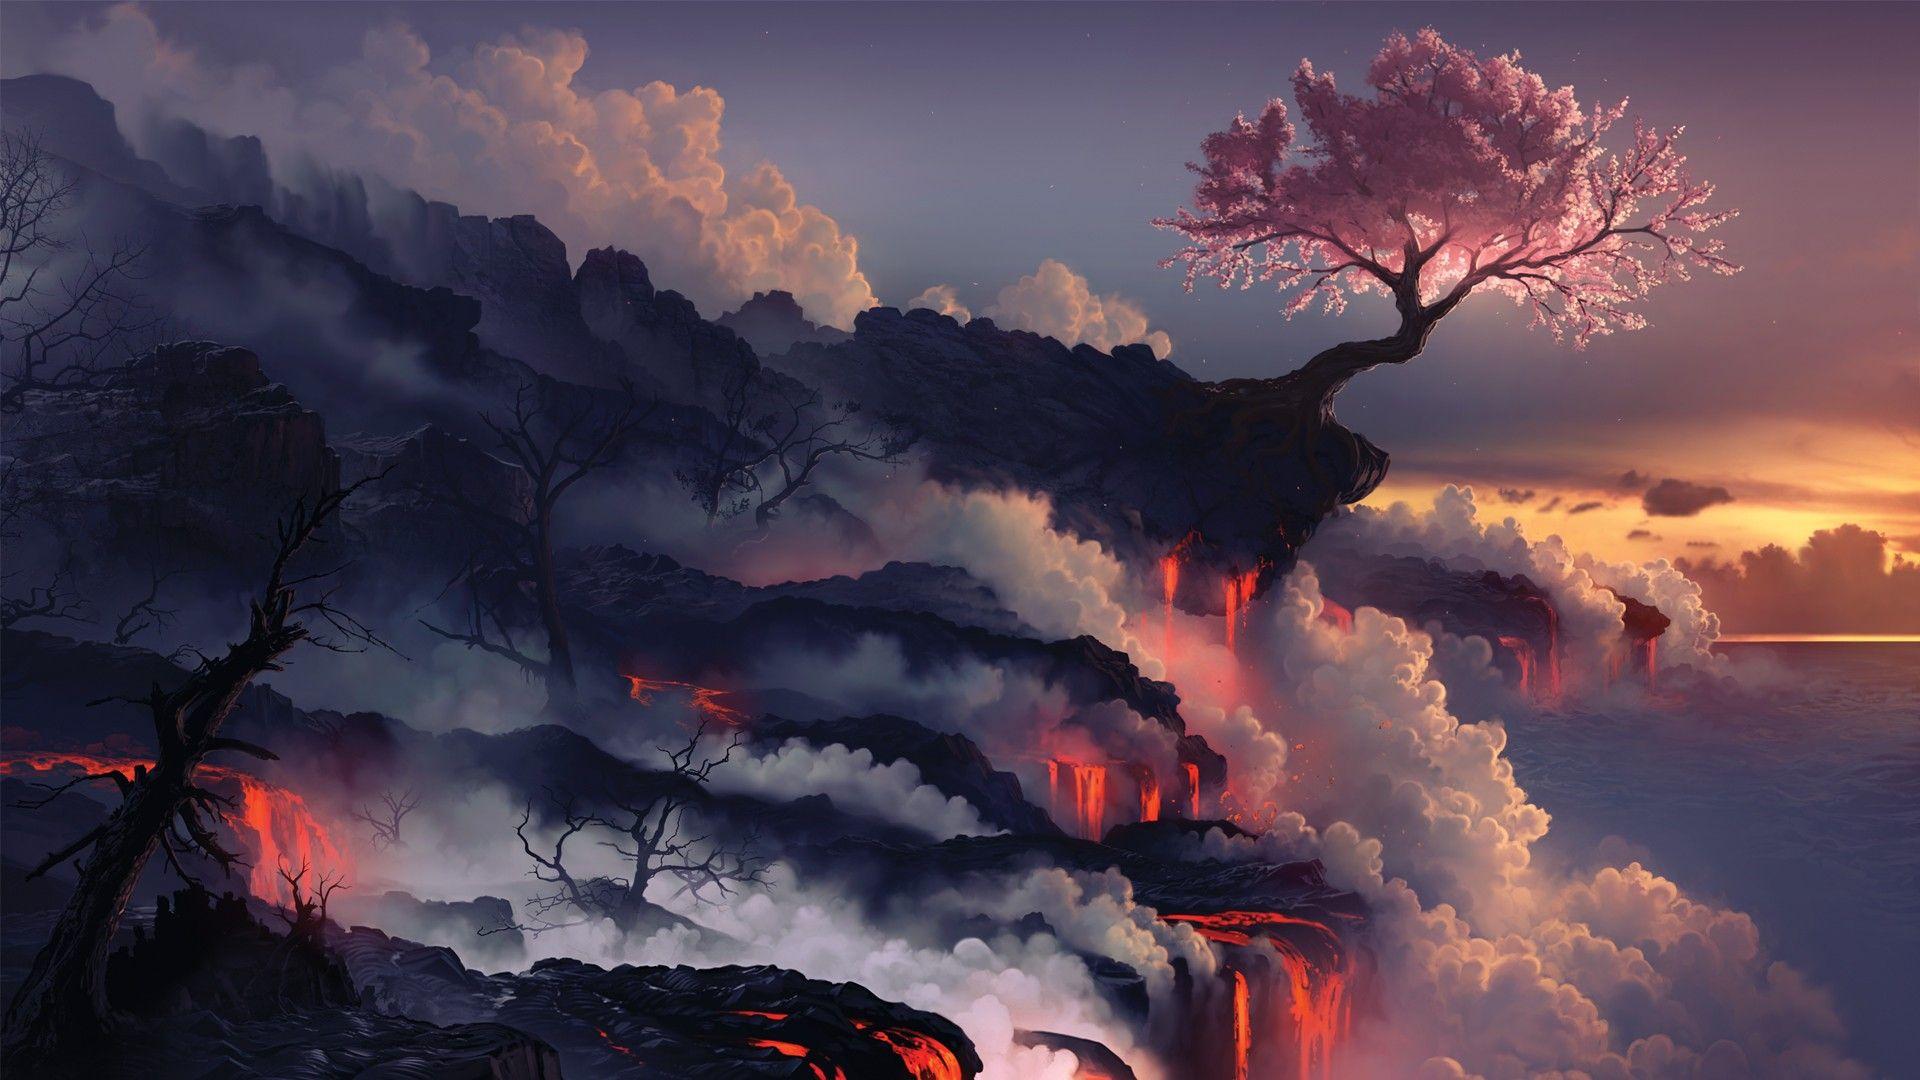 Cherry Blossom Clouds Landscape Petals Trees Sky Nature Wallpaper No 203028 Landscape Wallpaper Fantasy Landscape Volcano Wallpaper